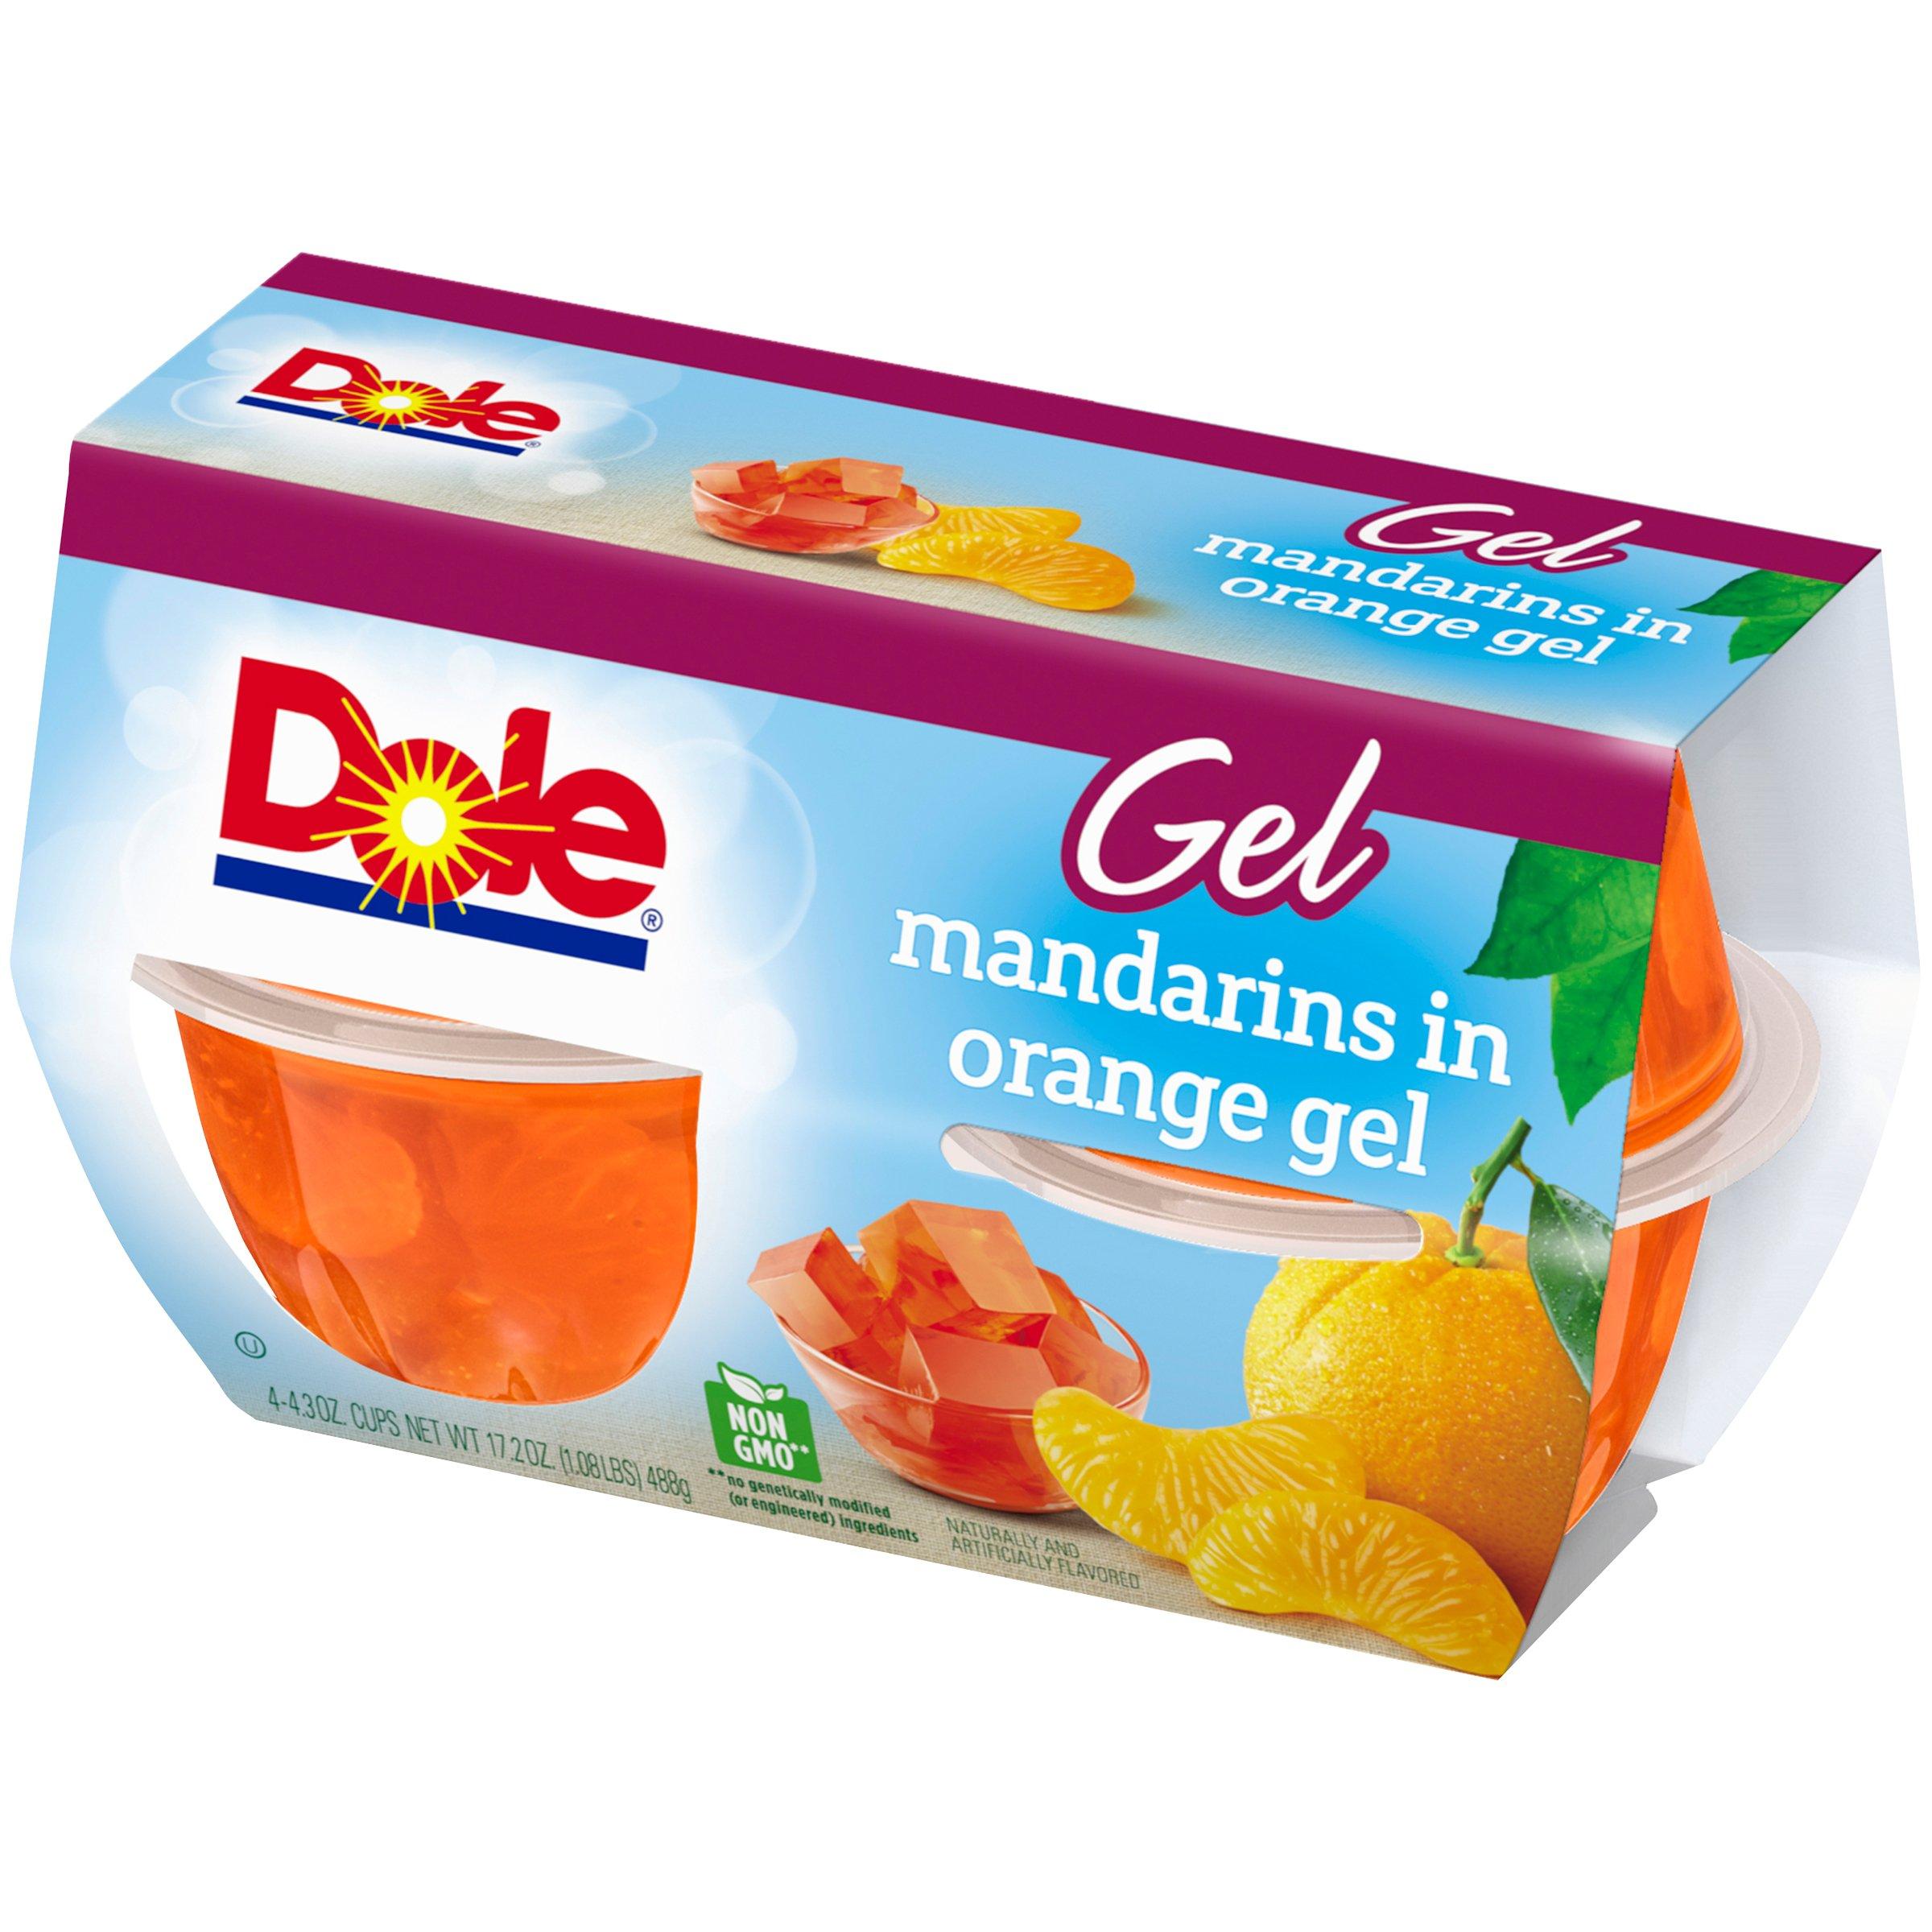 Dole Fruit Bowls, Mandarins in Orange Gel, 4 Cups by Dole Fruit (Image #7)